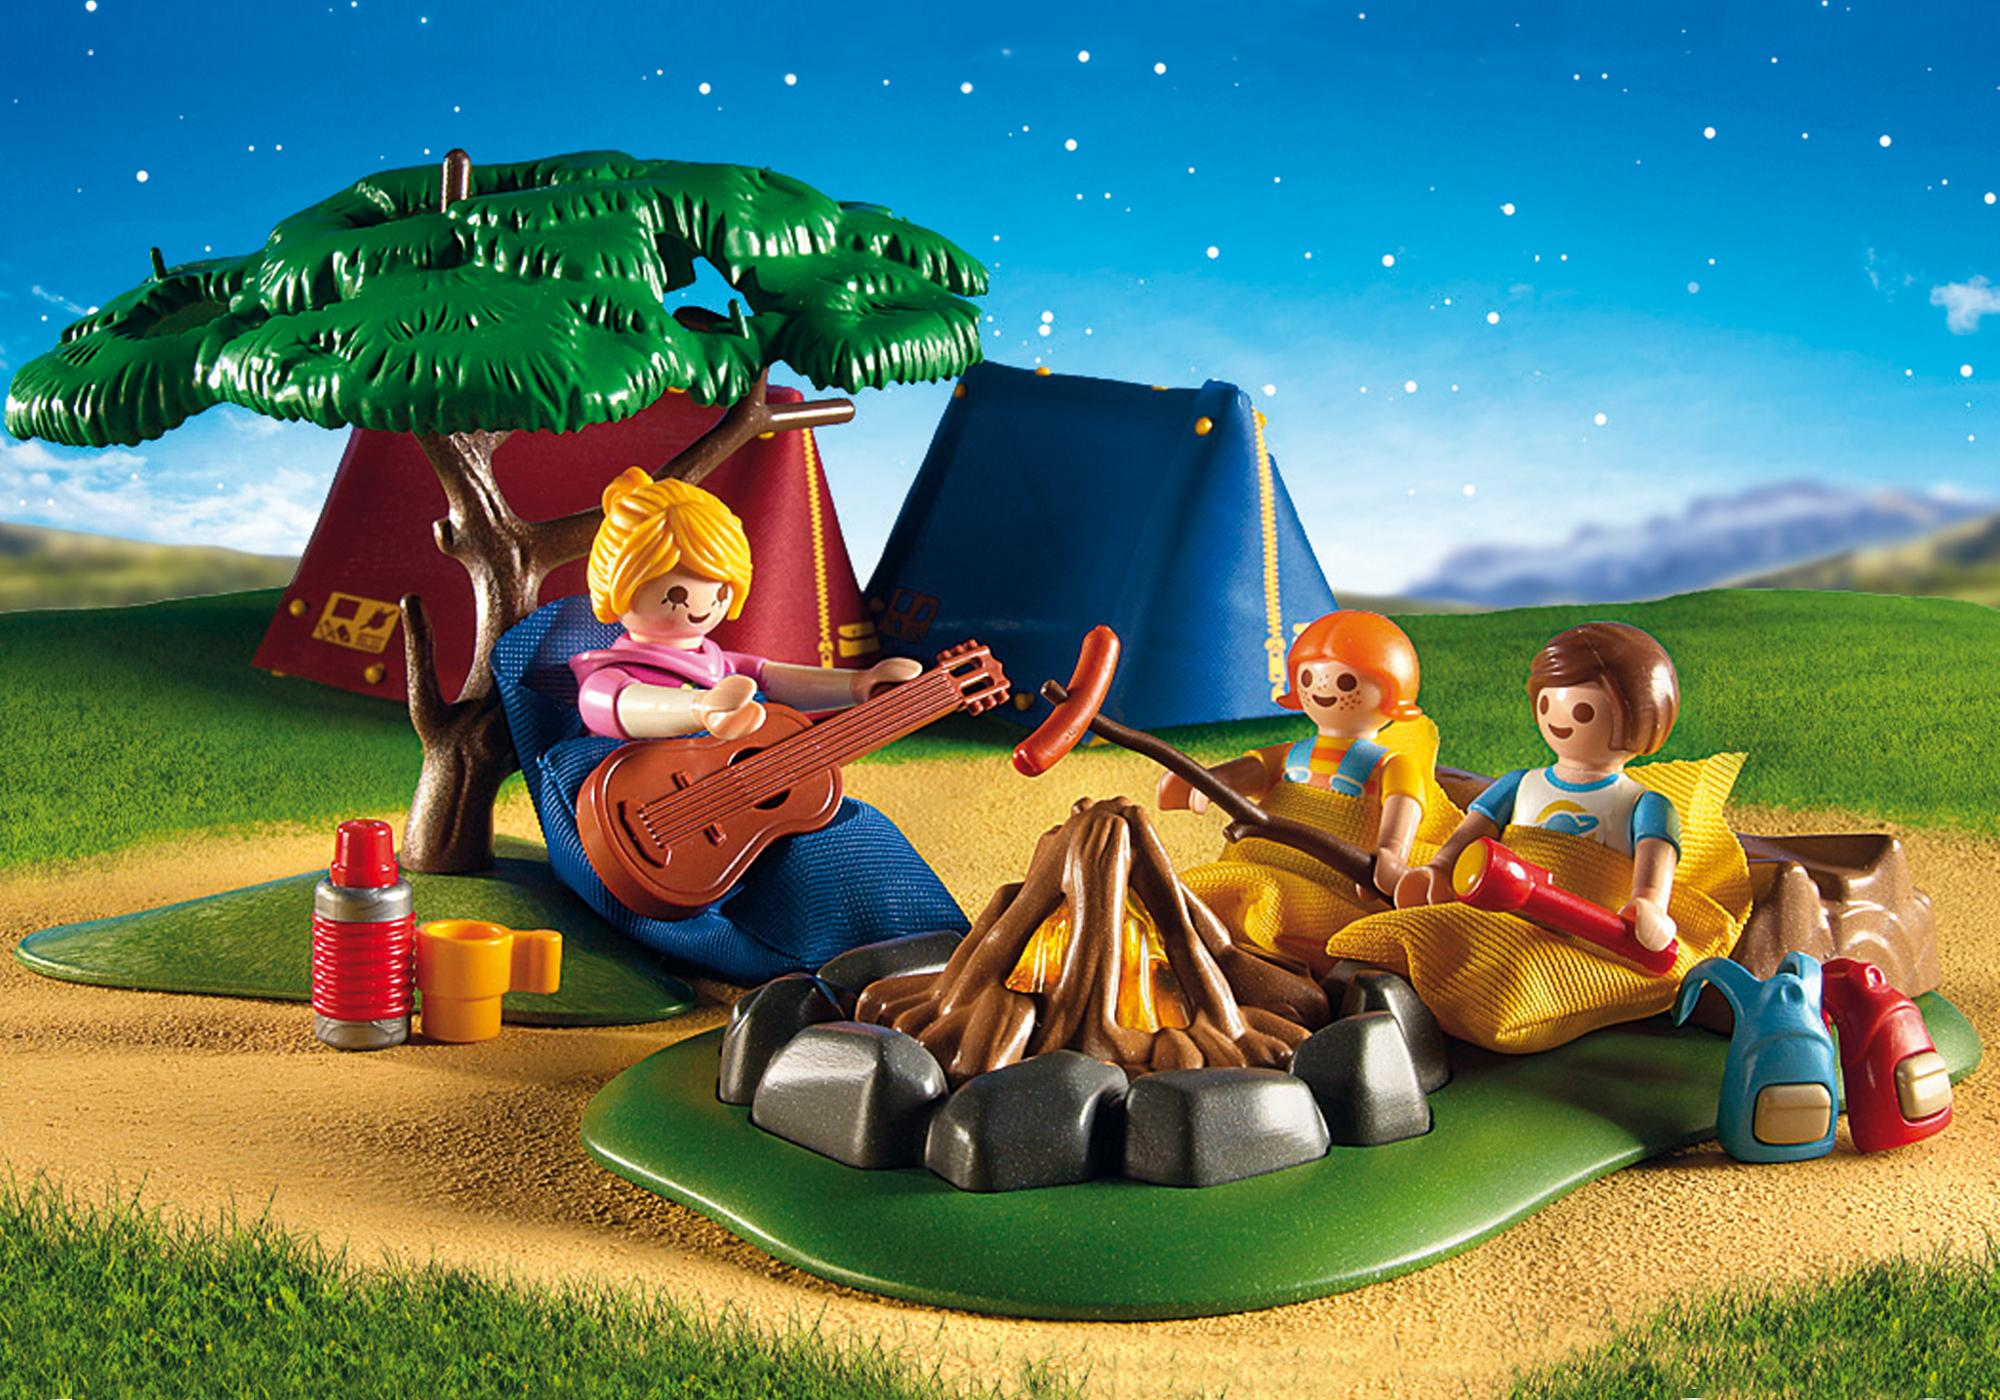 http://media.playmobil.com/i/playmobil/9153_product_extra1/Camp Site with Fire